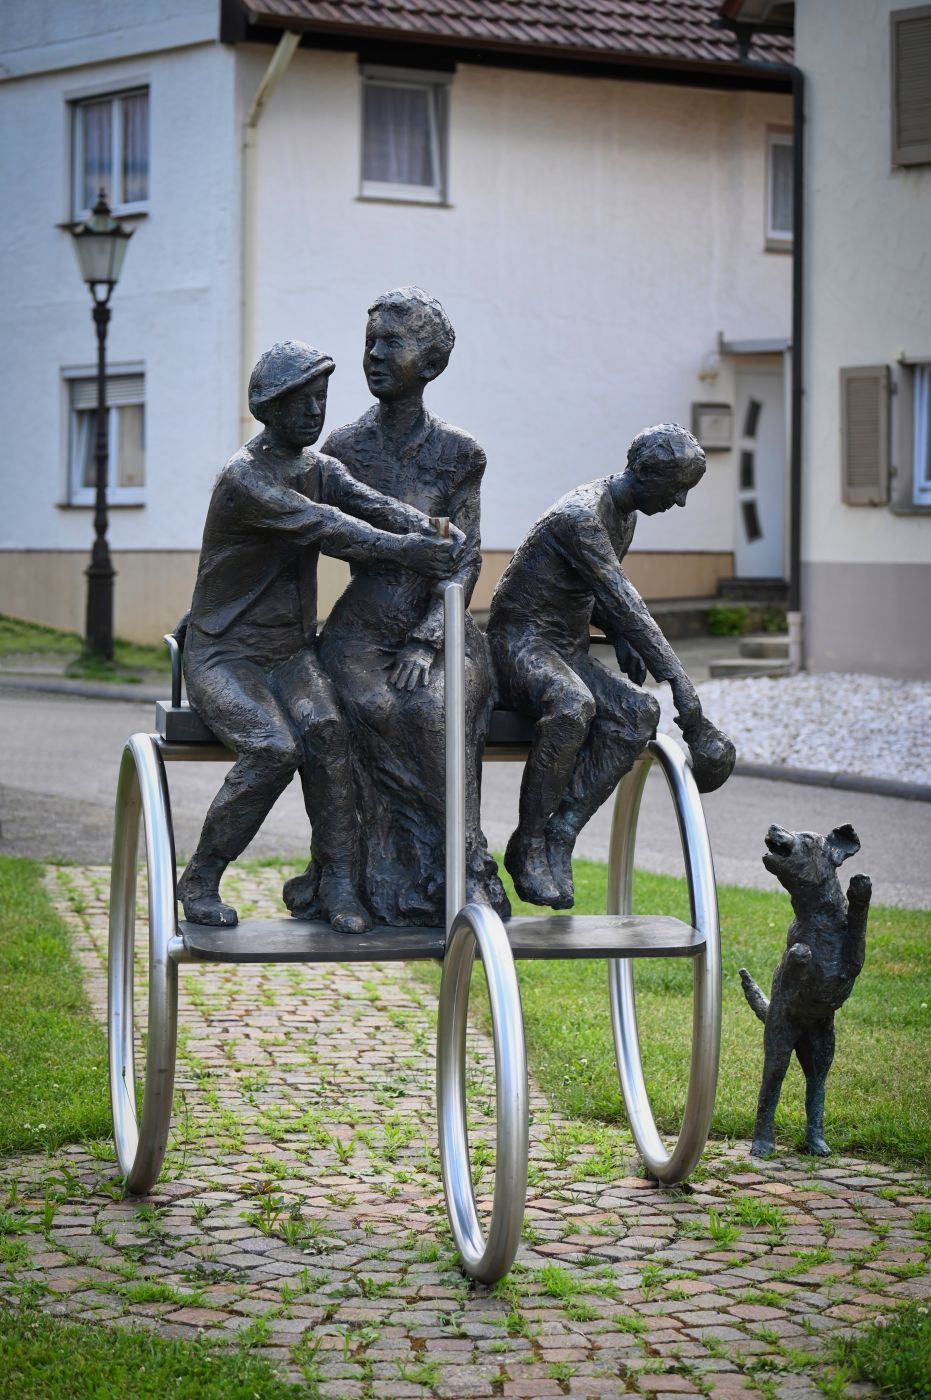 Berta Benz, Germany